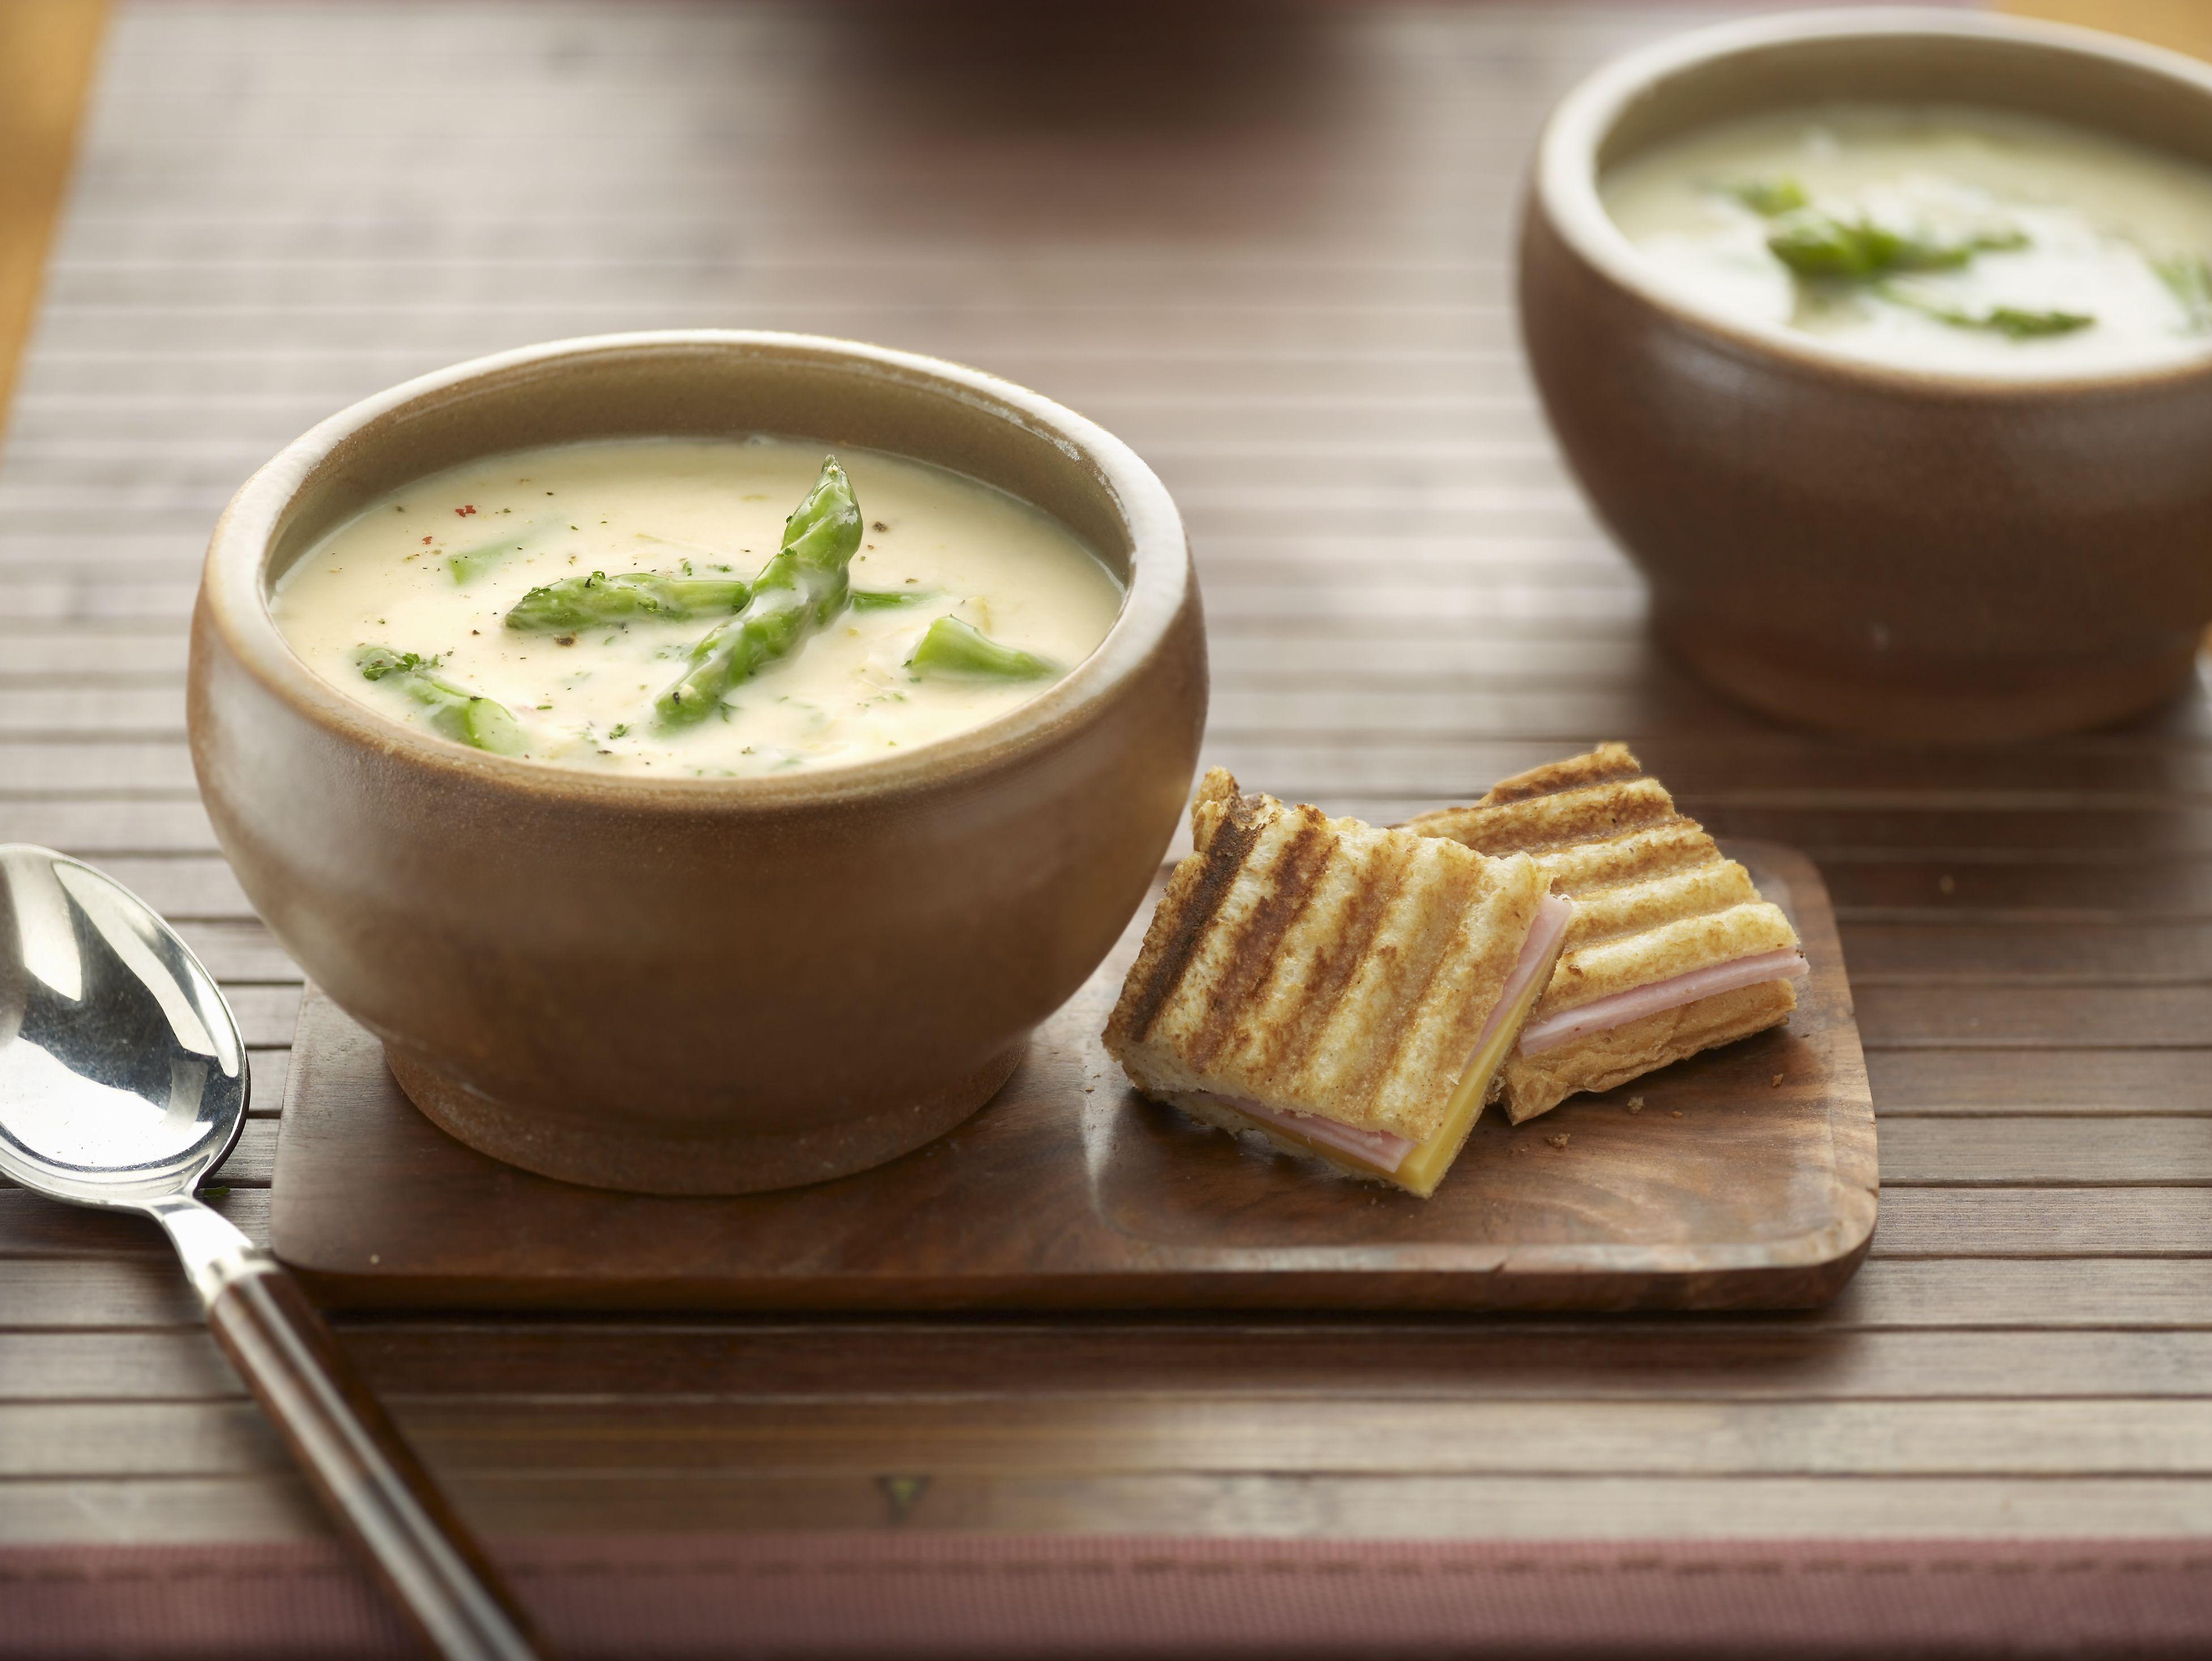 creamy asparagus soup recipe - Asparagas Soup